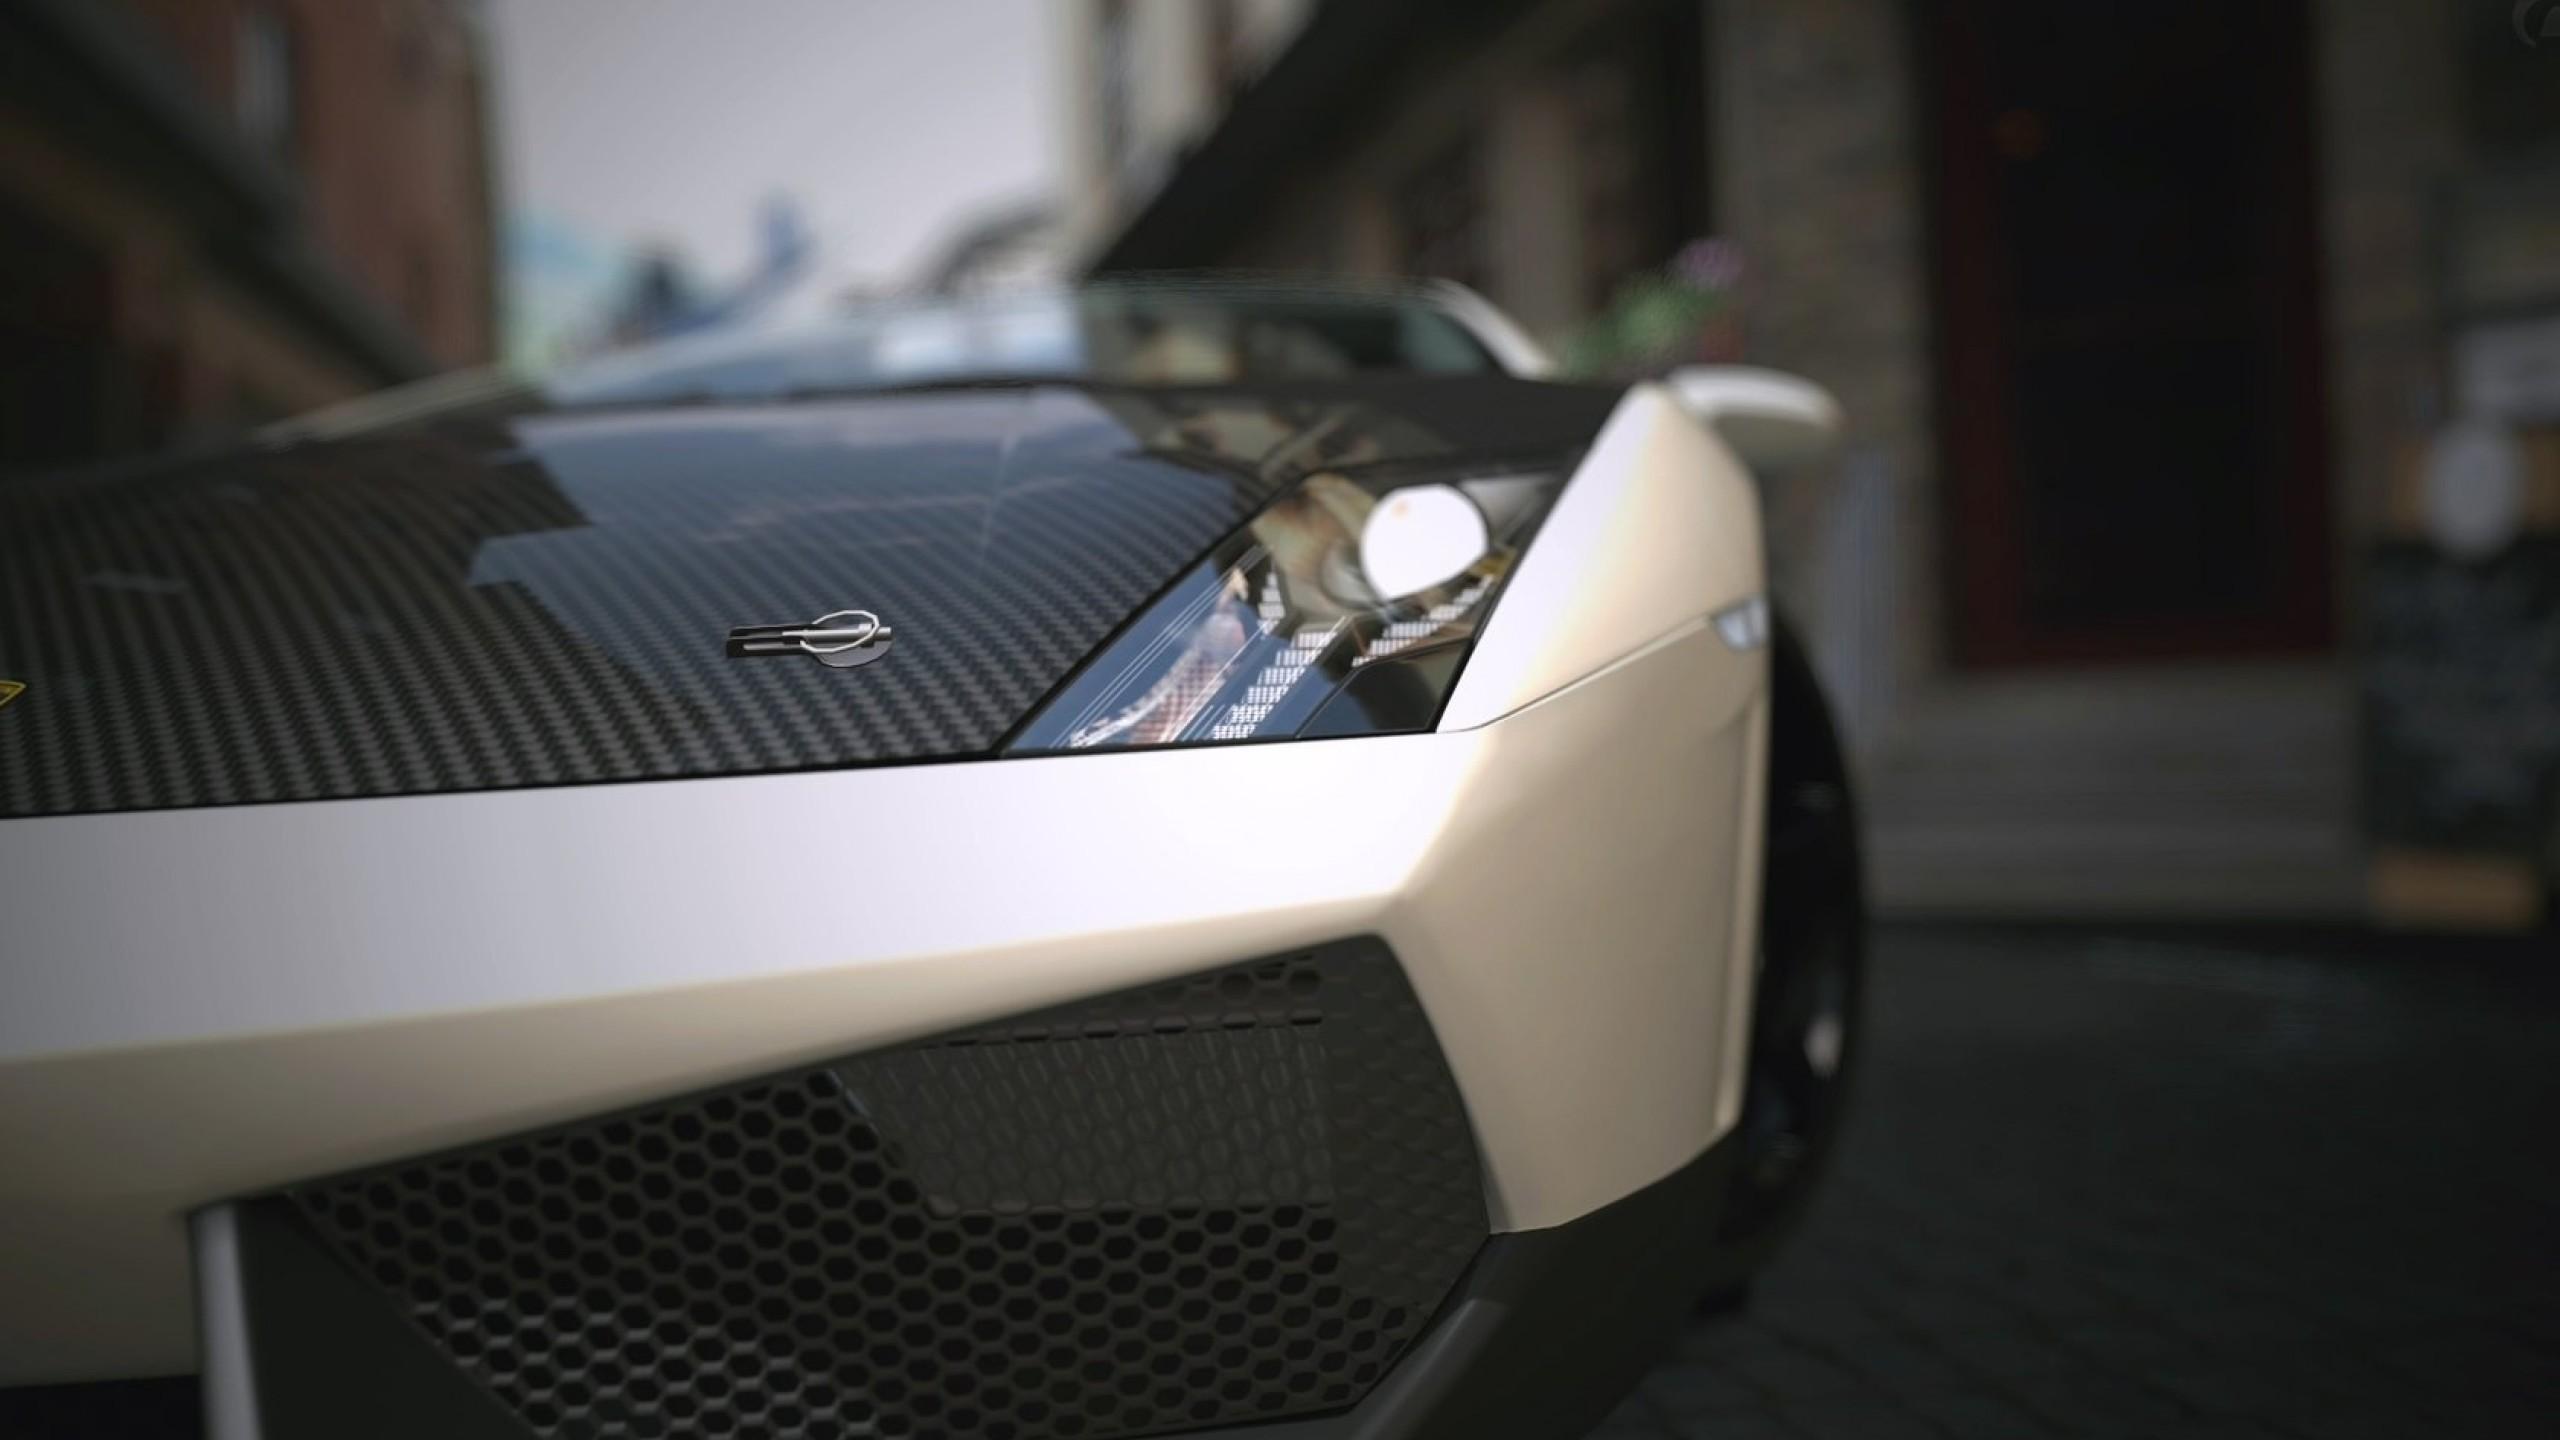 Lamborghini Wallpaper 1080p 74 Pictures